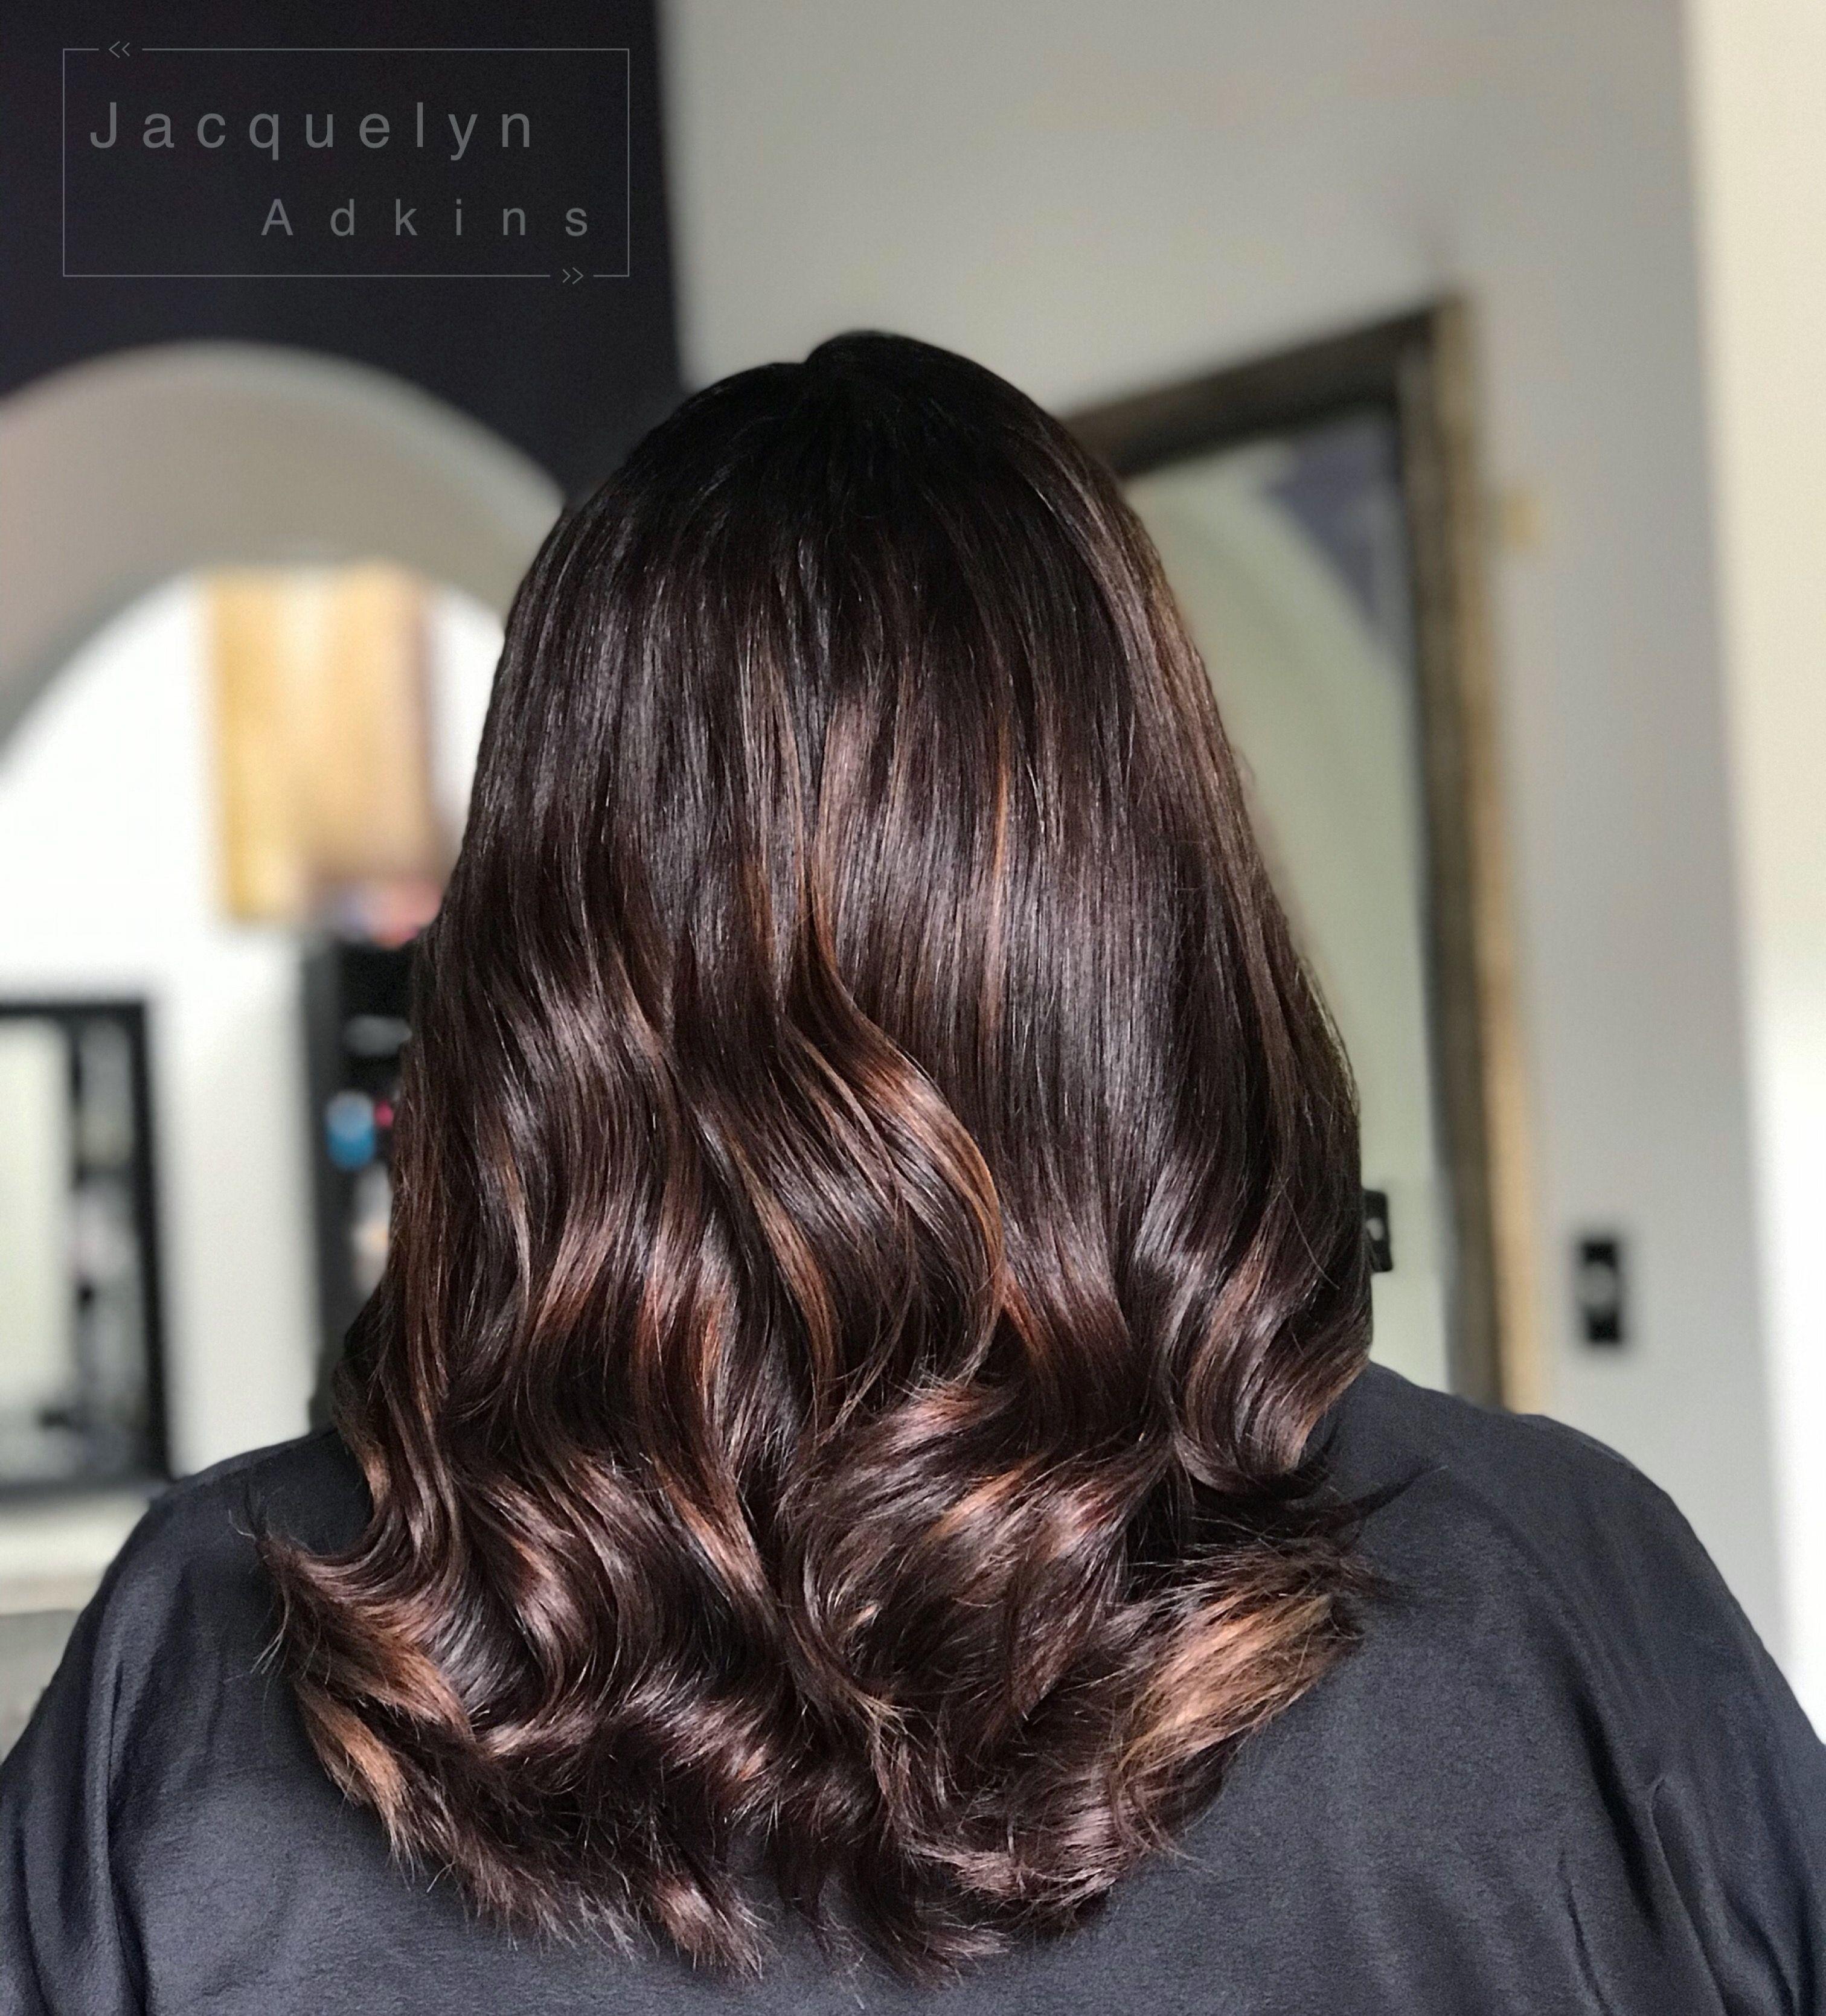 Follow My Instagram Unevneib Caramel Balayage Dark Root Natural Root Short Hair Medium Length Hair Shoulder Length Hair Spring Hair Lighter Hair Dark Balayage